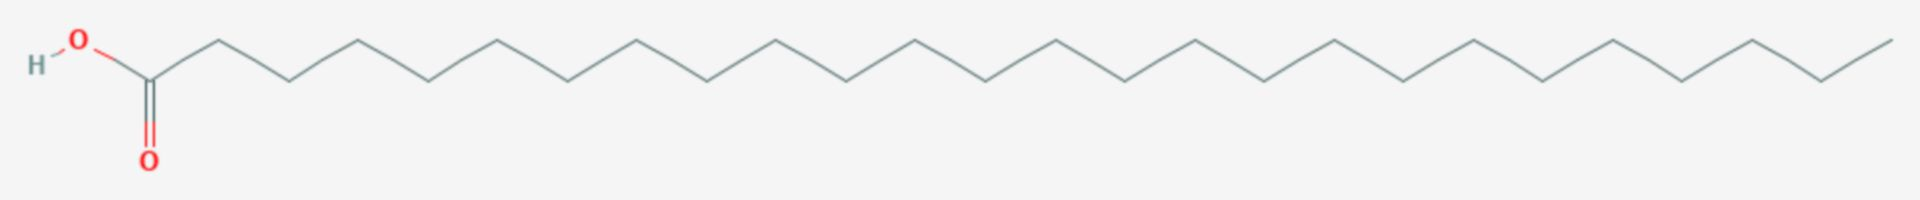 Cerotinsäure (Strukturformel)